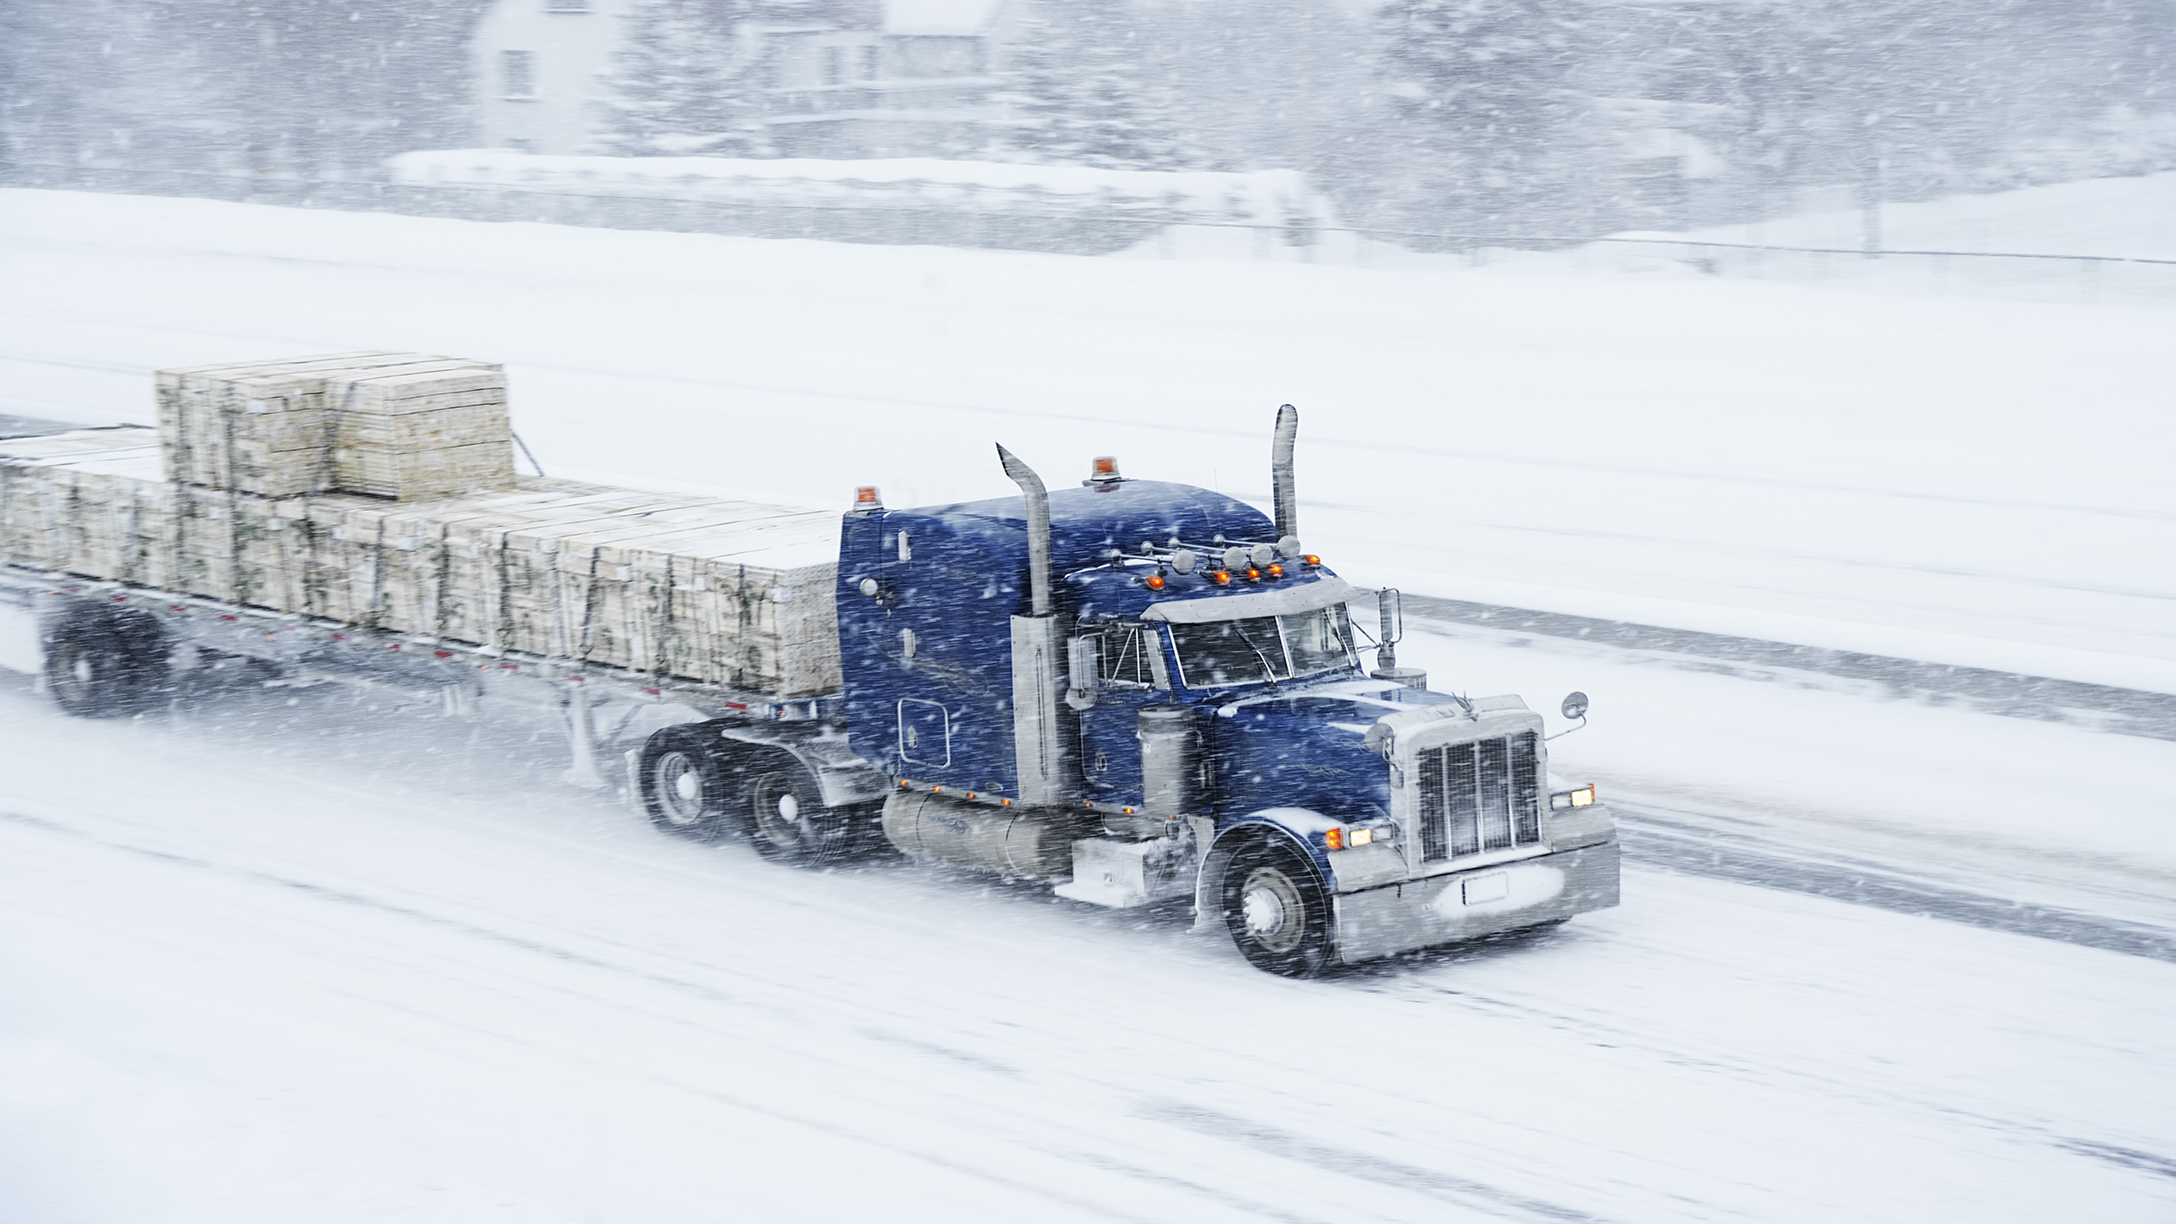 A truck driving through a blizzard